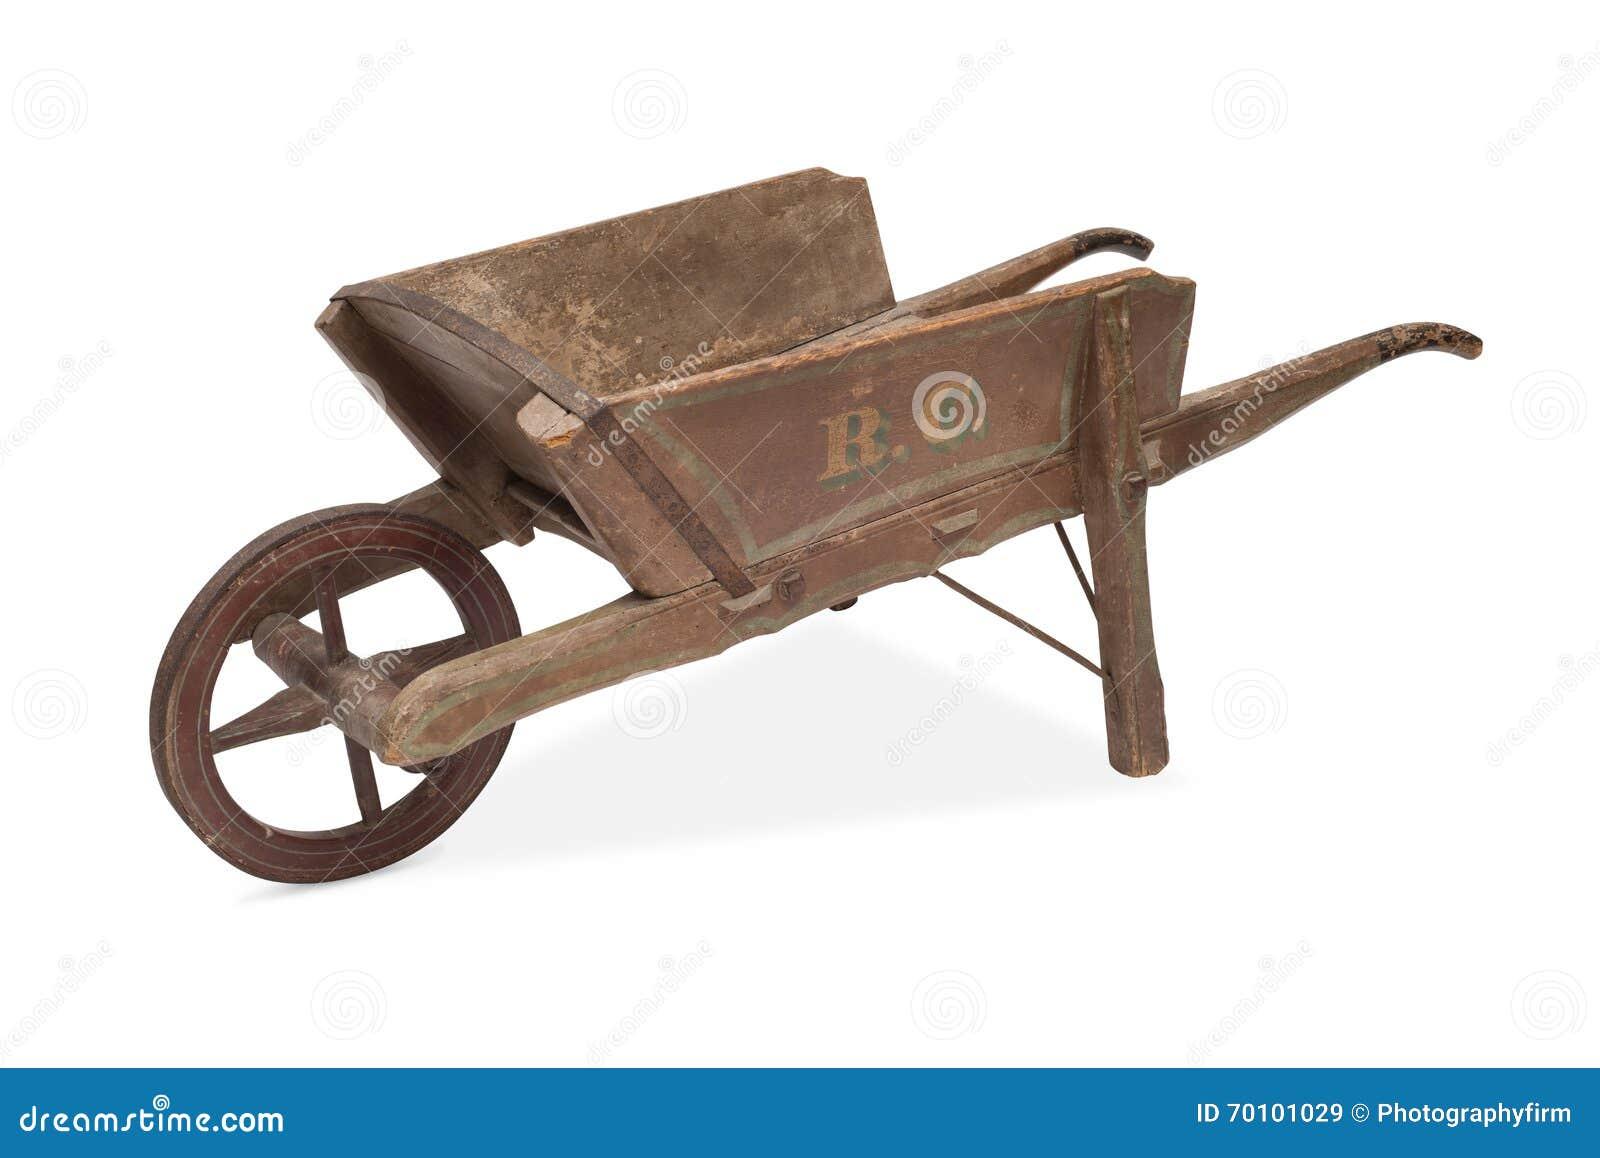 une brouette antique image stock image du wooden modifi 70101029. Black Bedroom Furniture Sets. Home Design Ideas